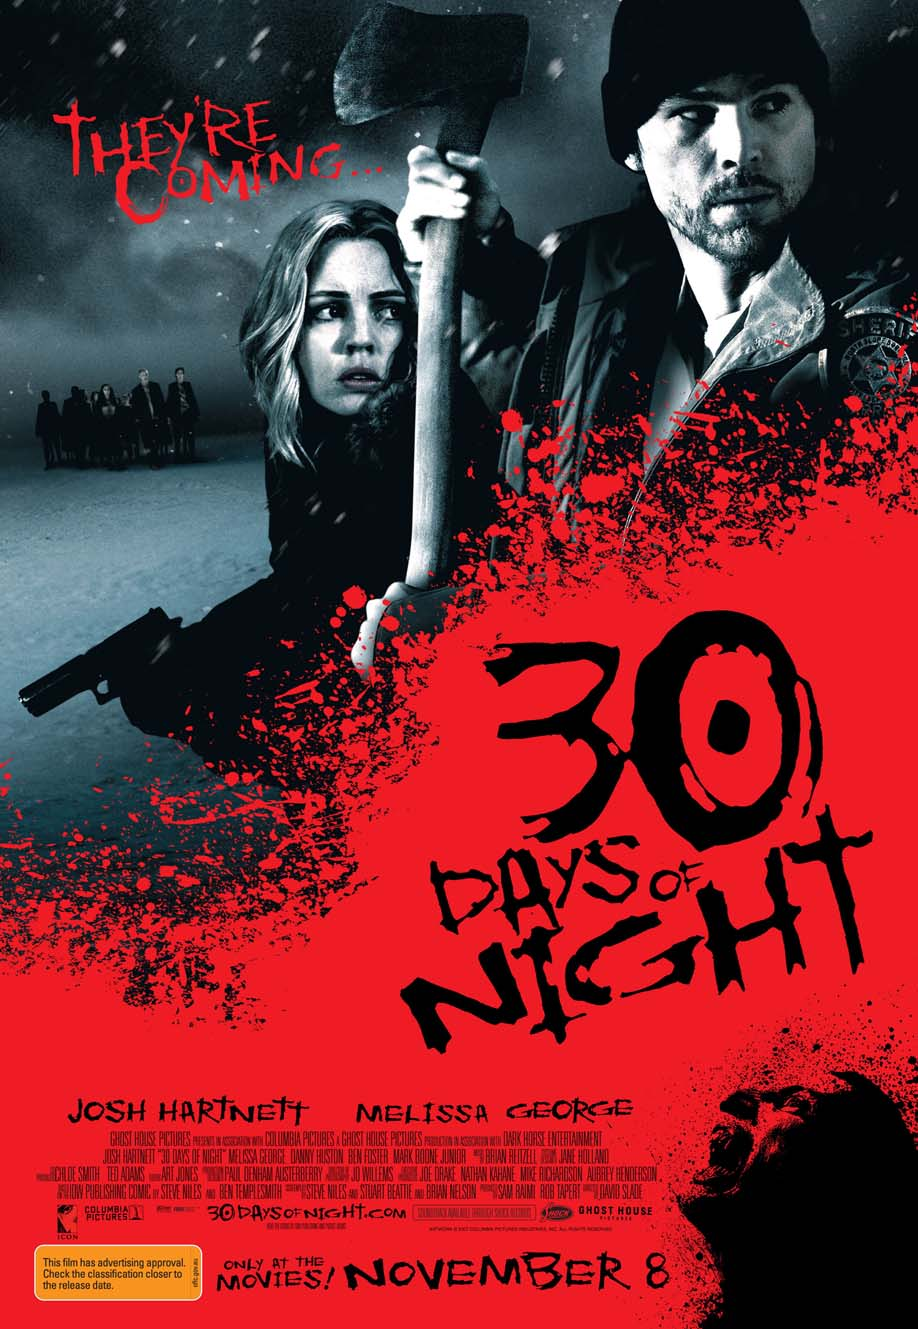 30 Days Of Night (2007) - poster